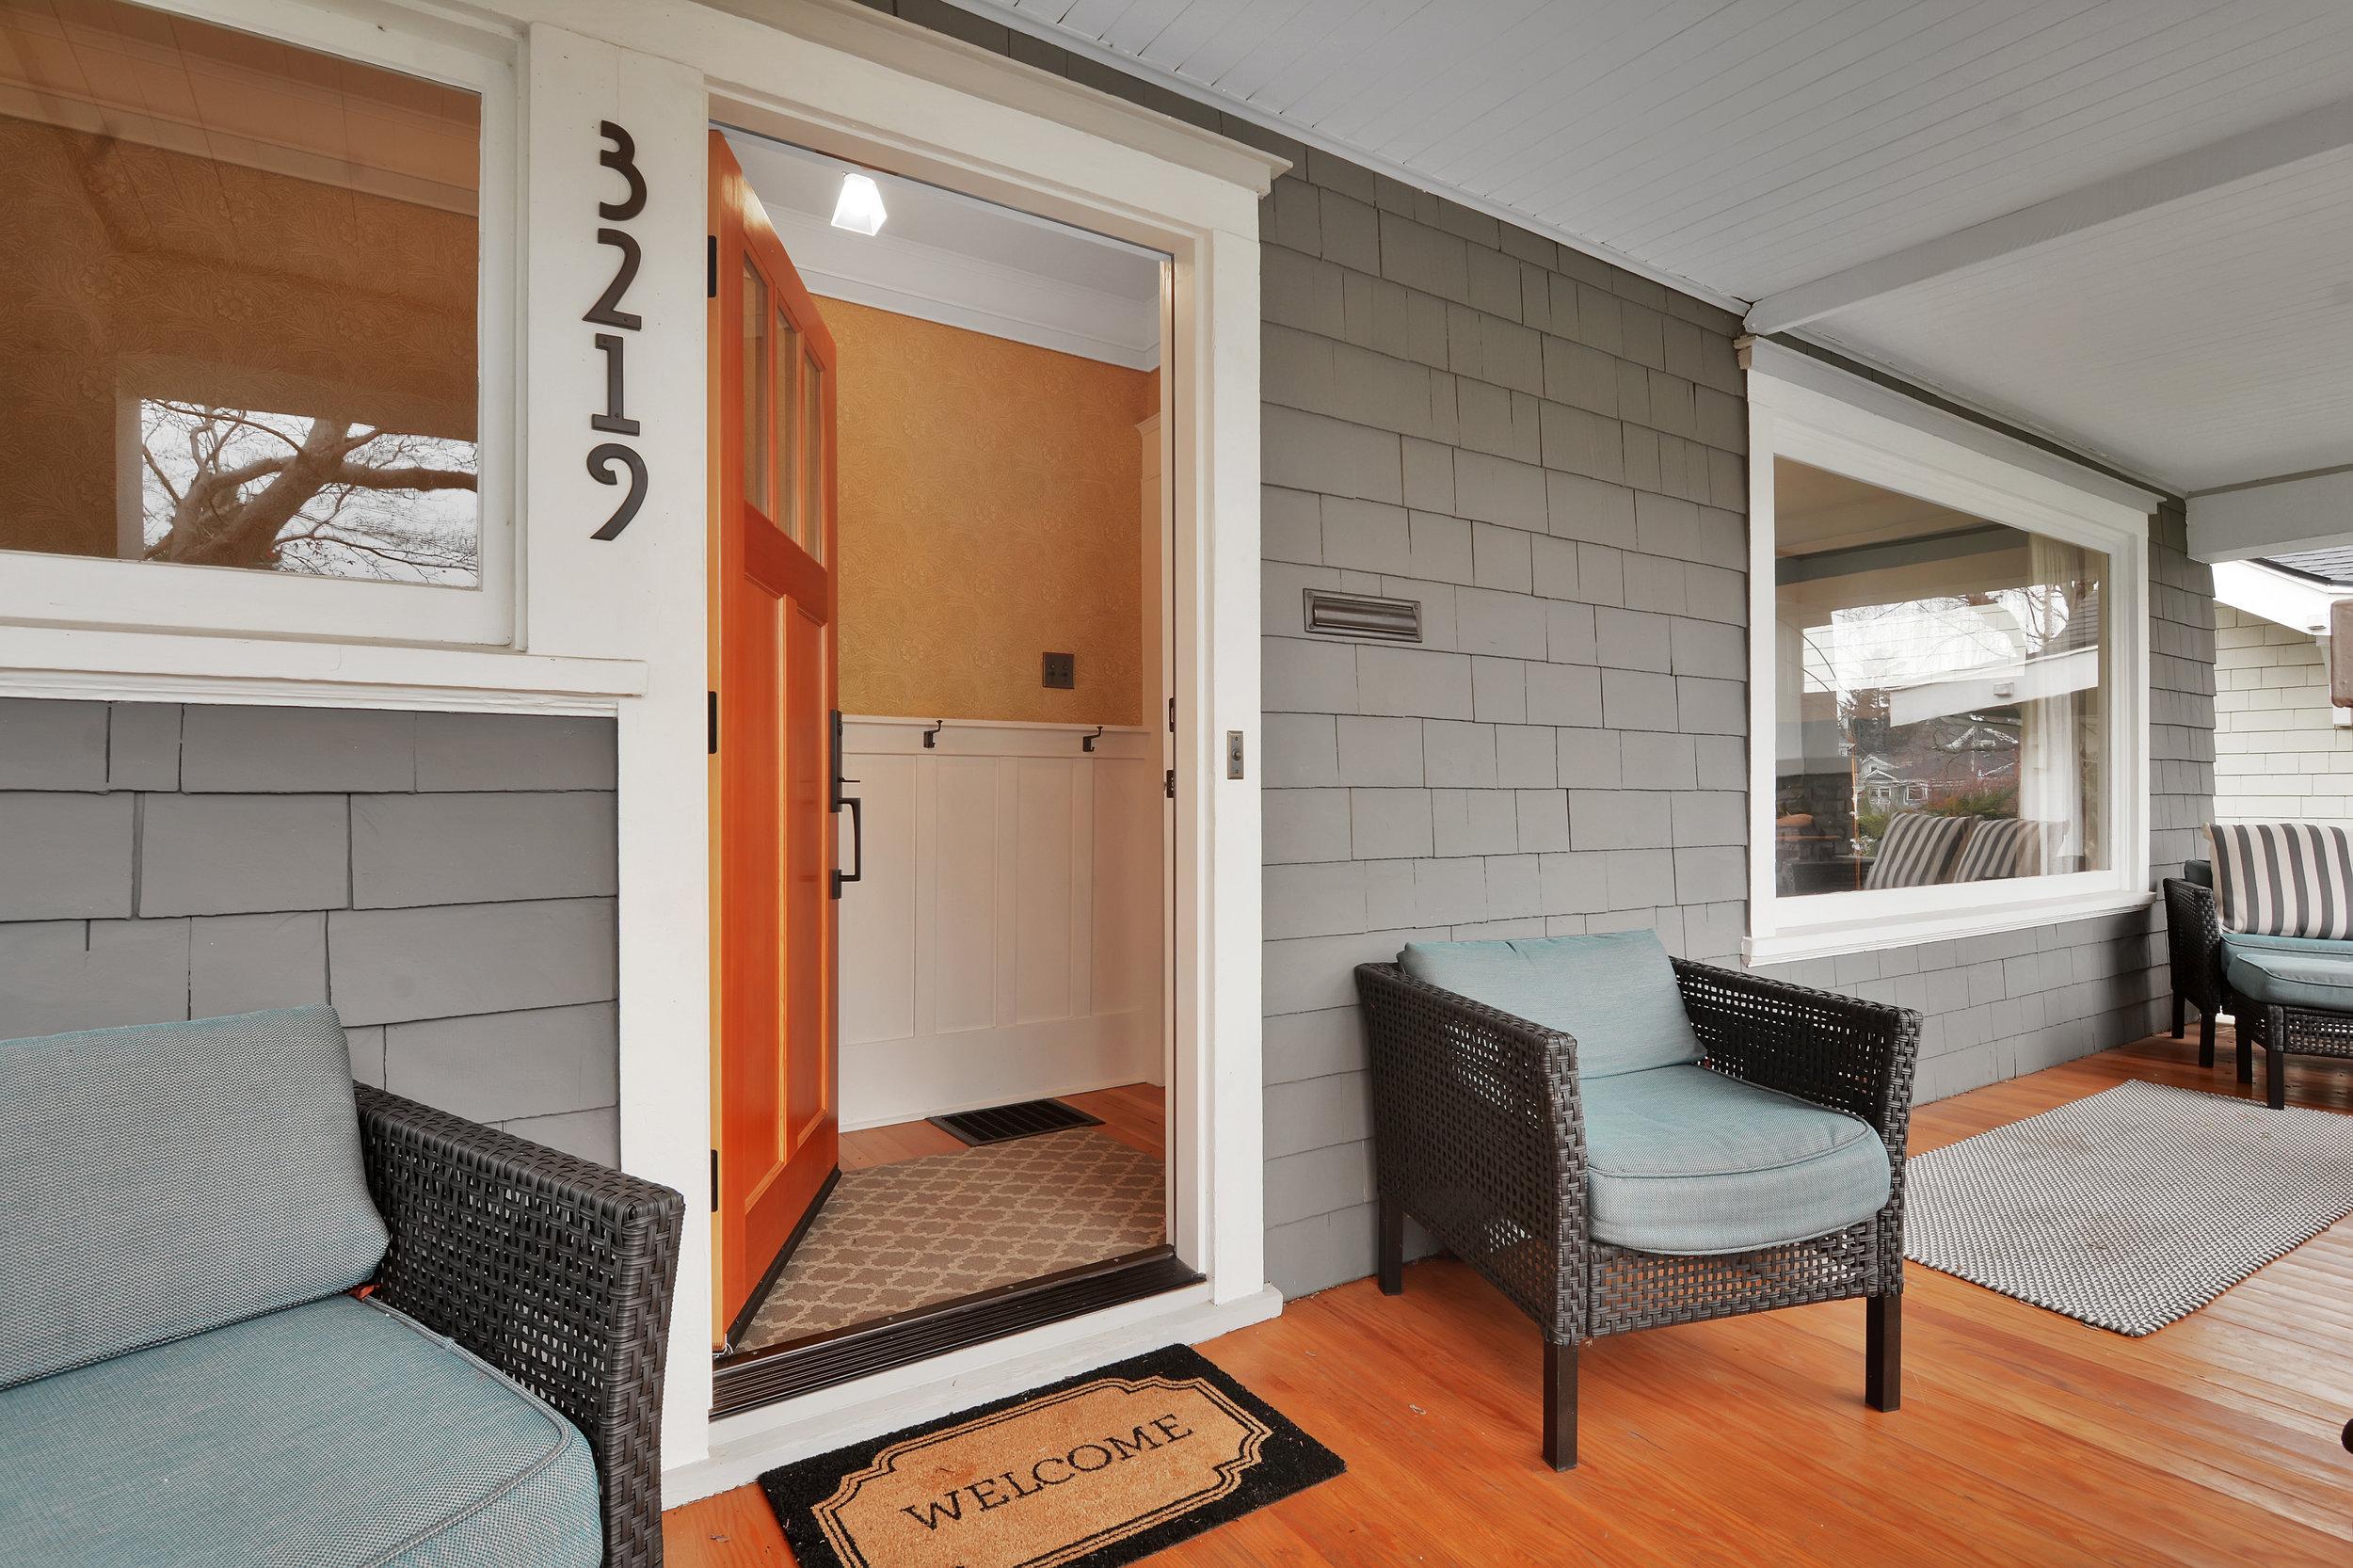 Front door detail. Cedar shake siding, fir flooring, and double pane storm windows.